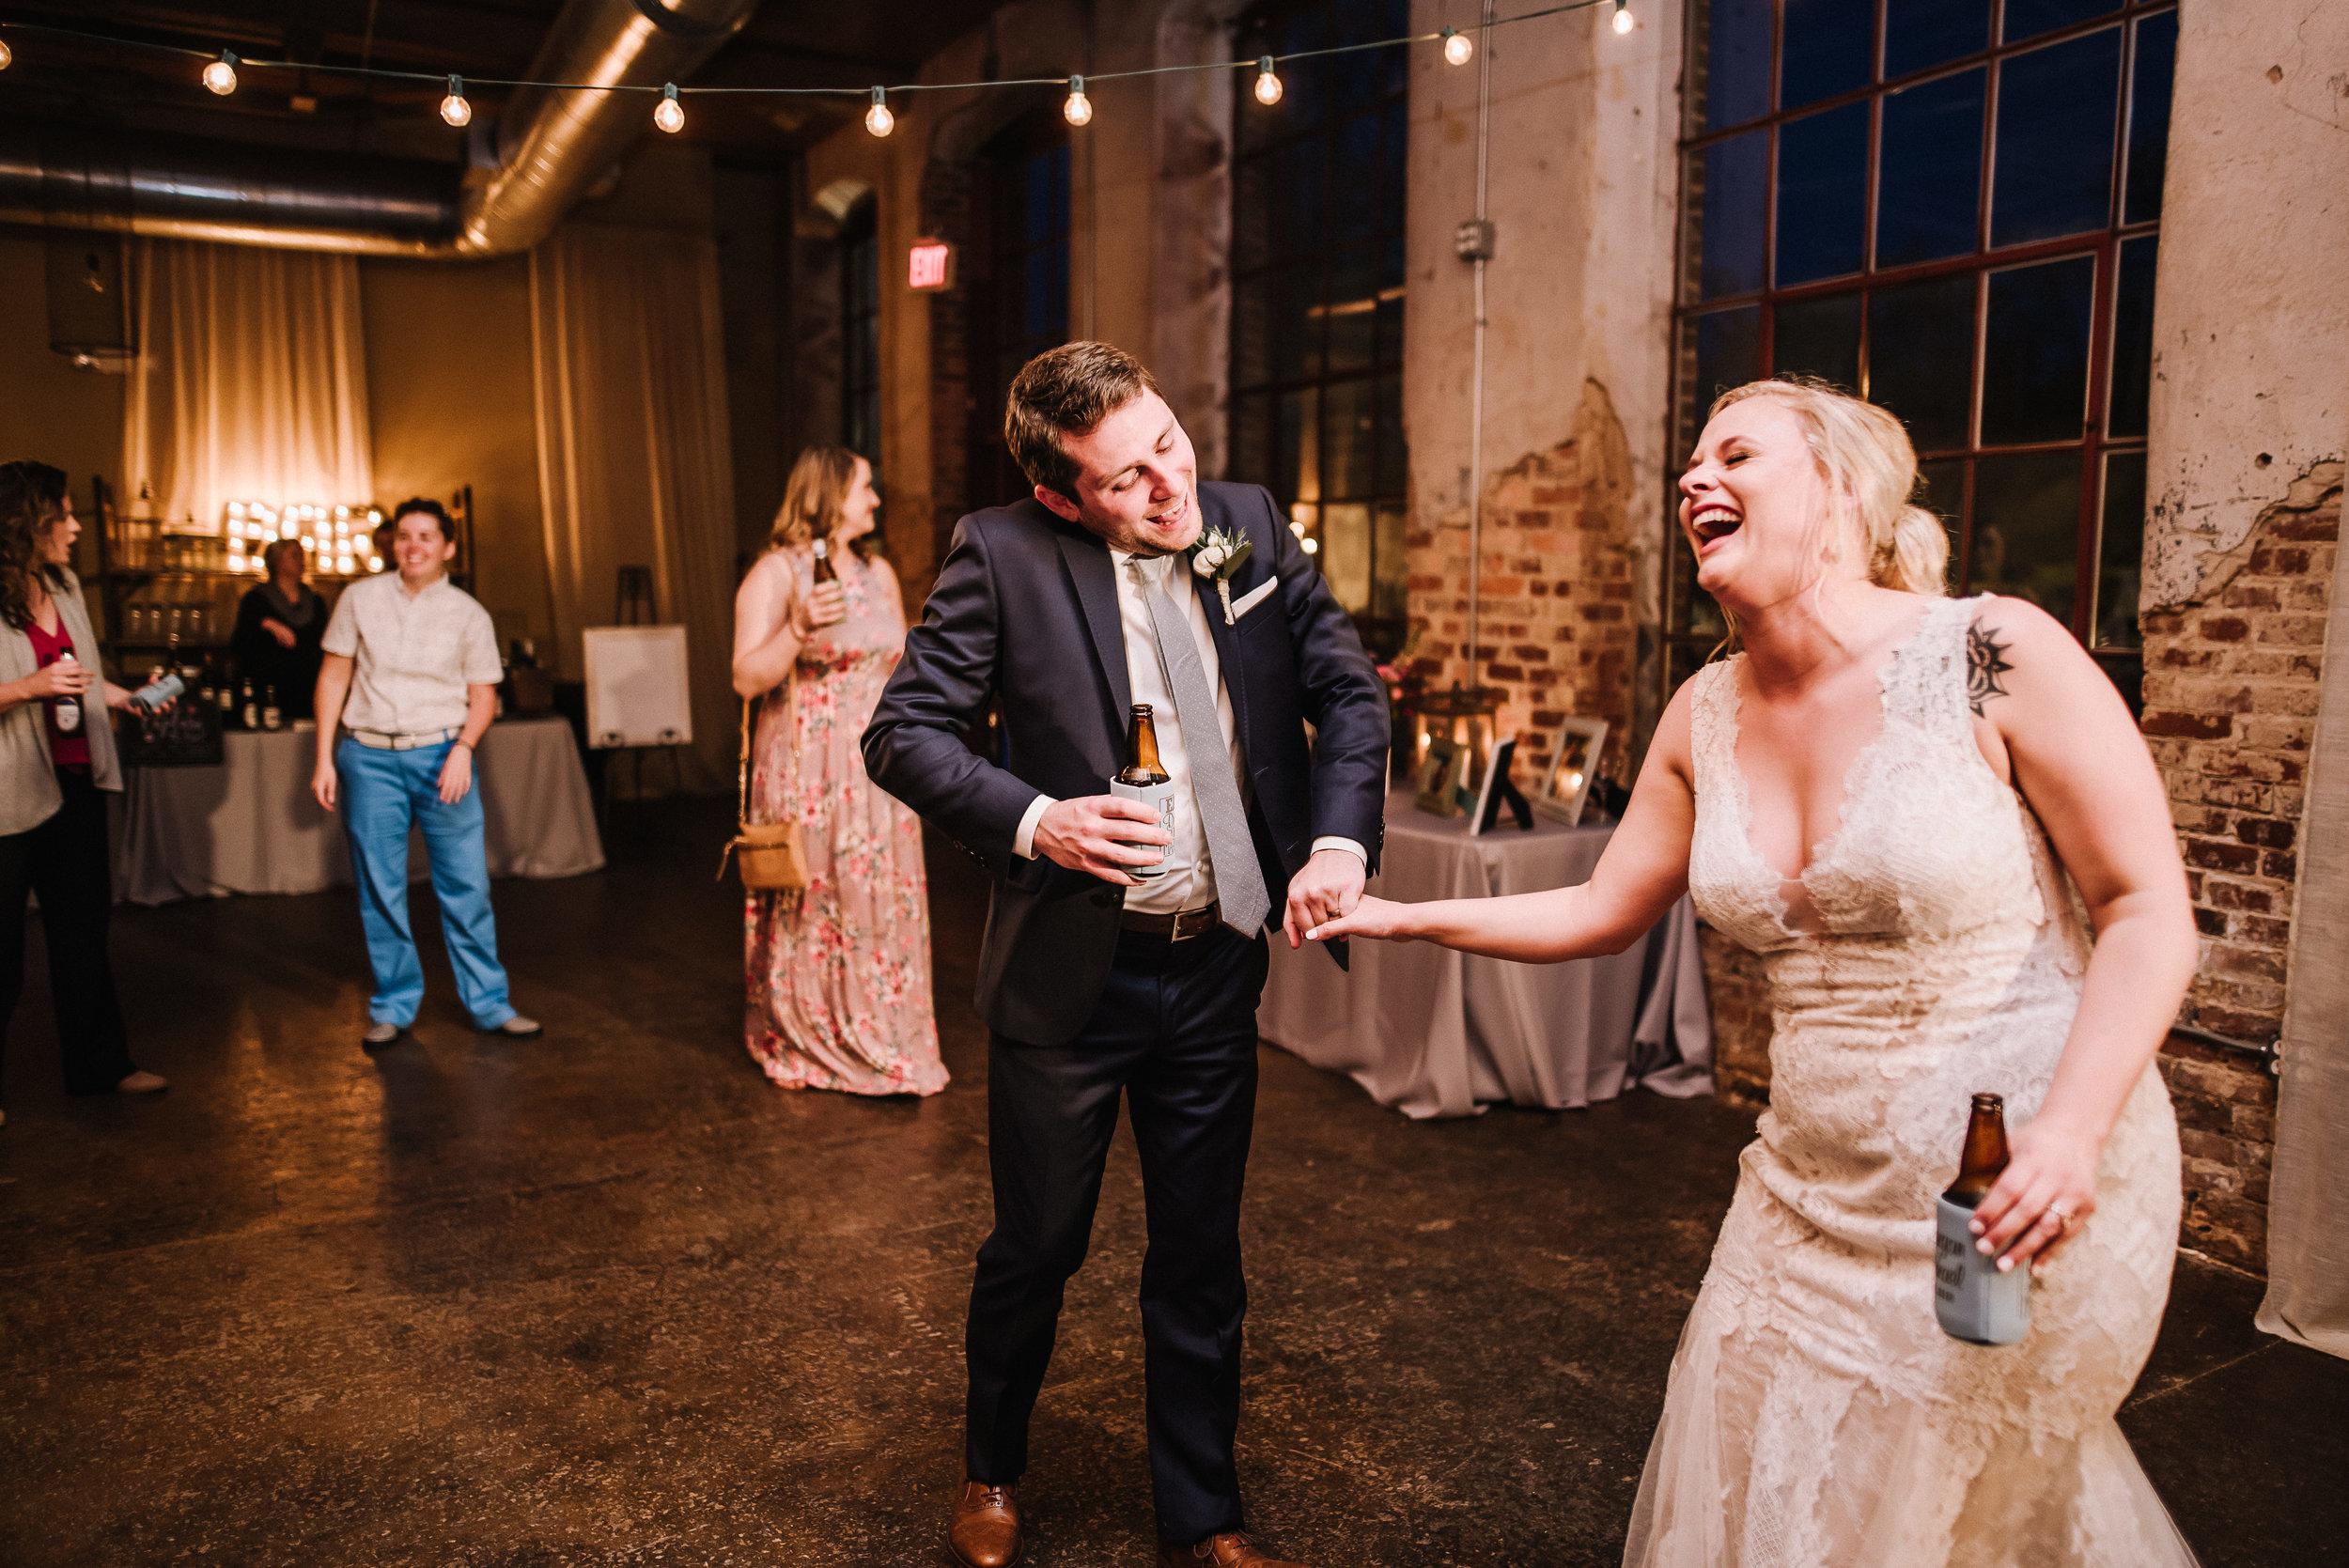 Morgan Wedding_Mill at Yellow River_Ashley Benham Photography-1148.jpg